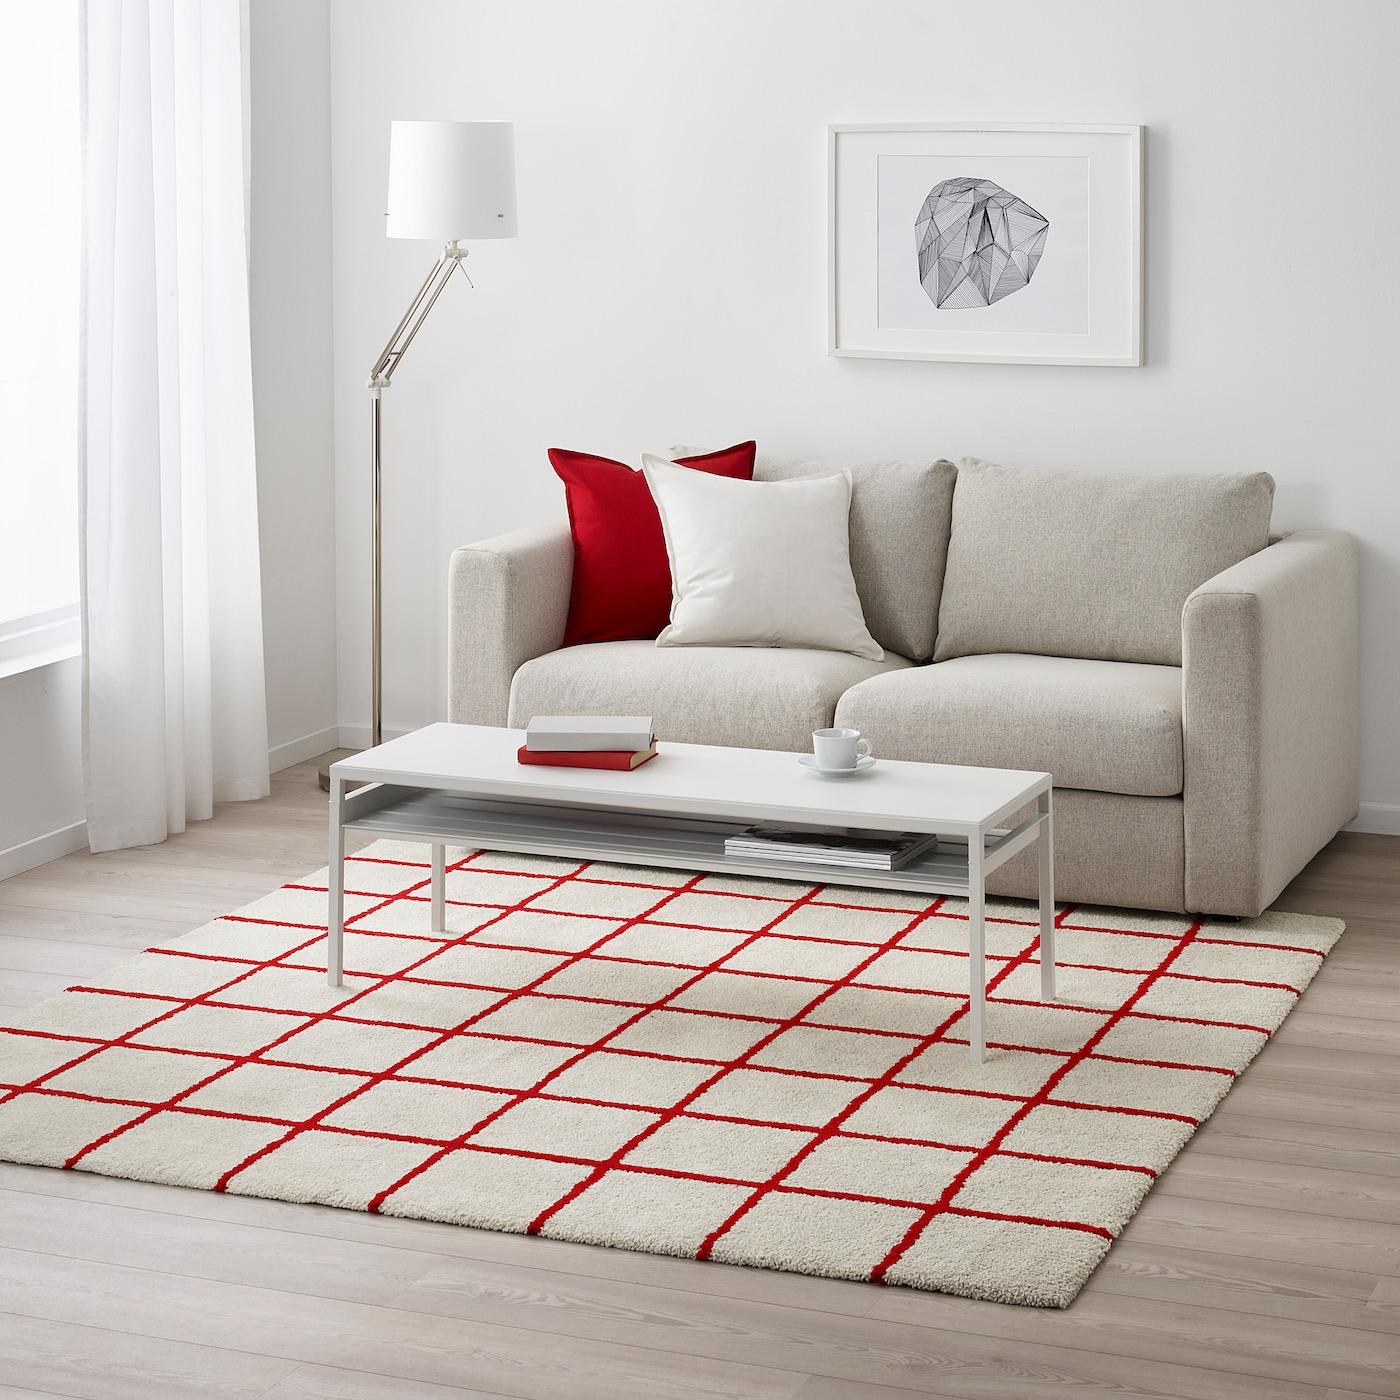 SIMESTED Alfombra, pelo largo, blanco, rojo IKEA